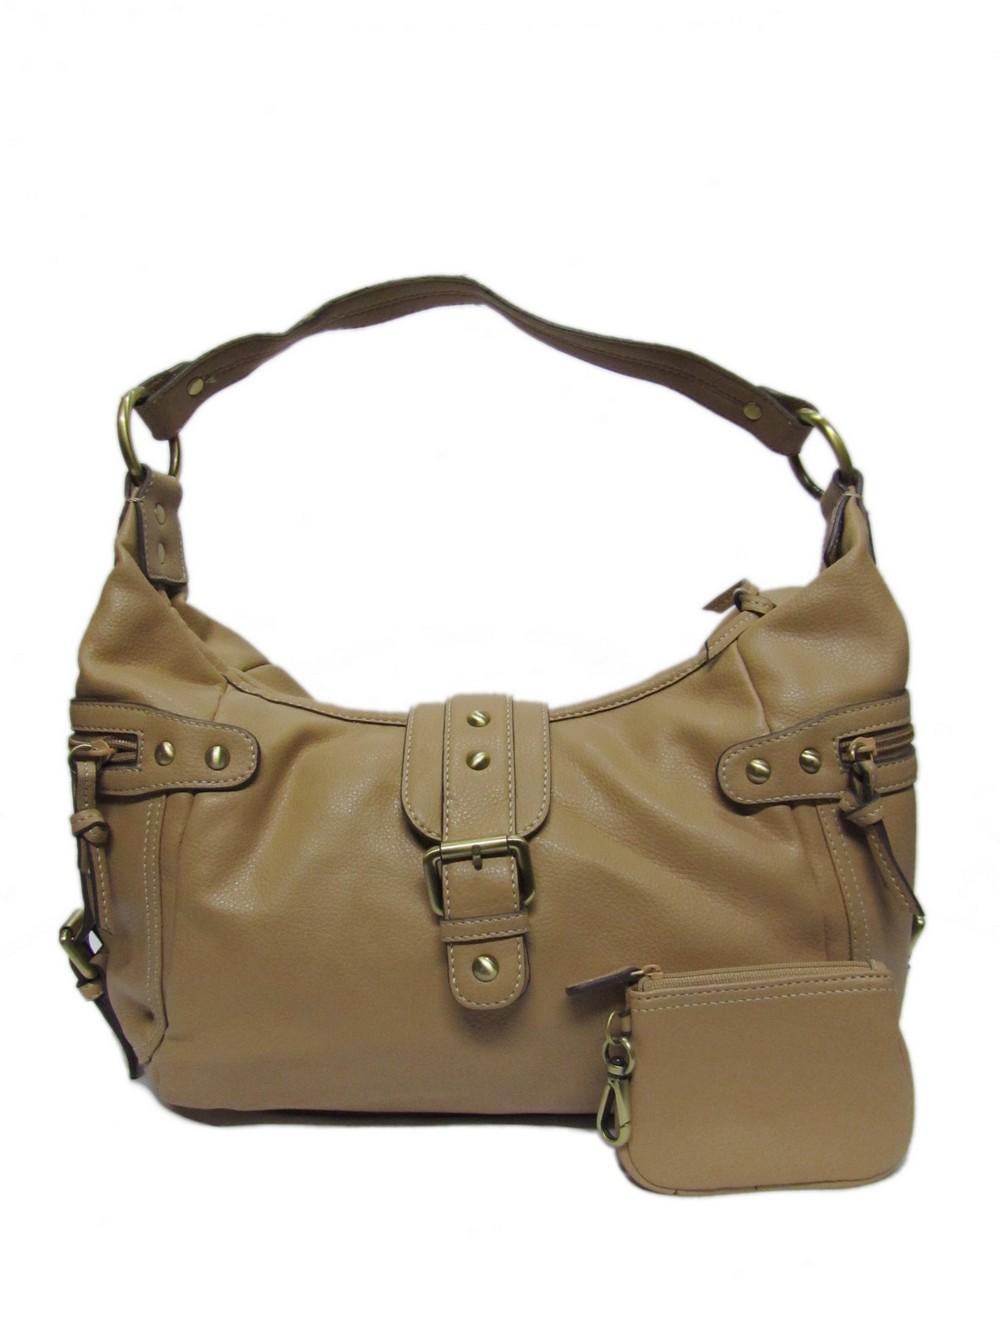 vegan purse purses online shopping luxury bags